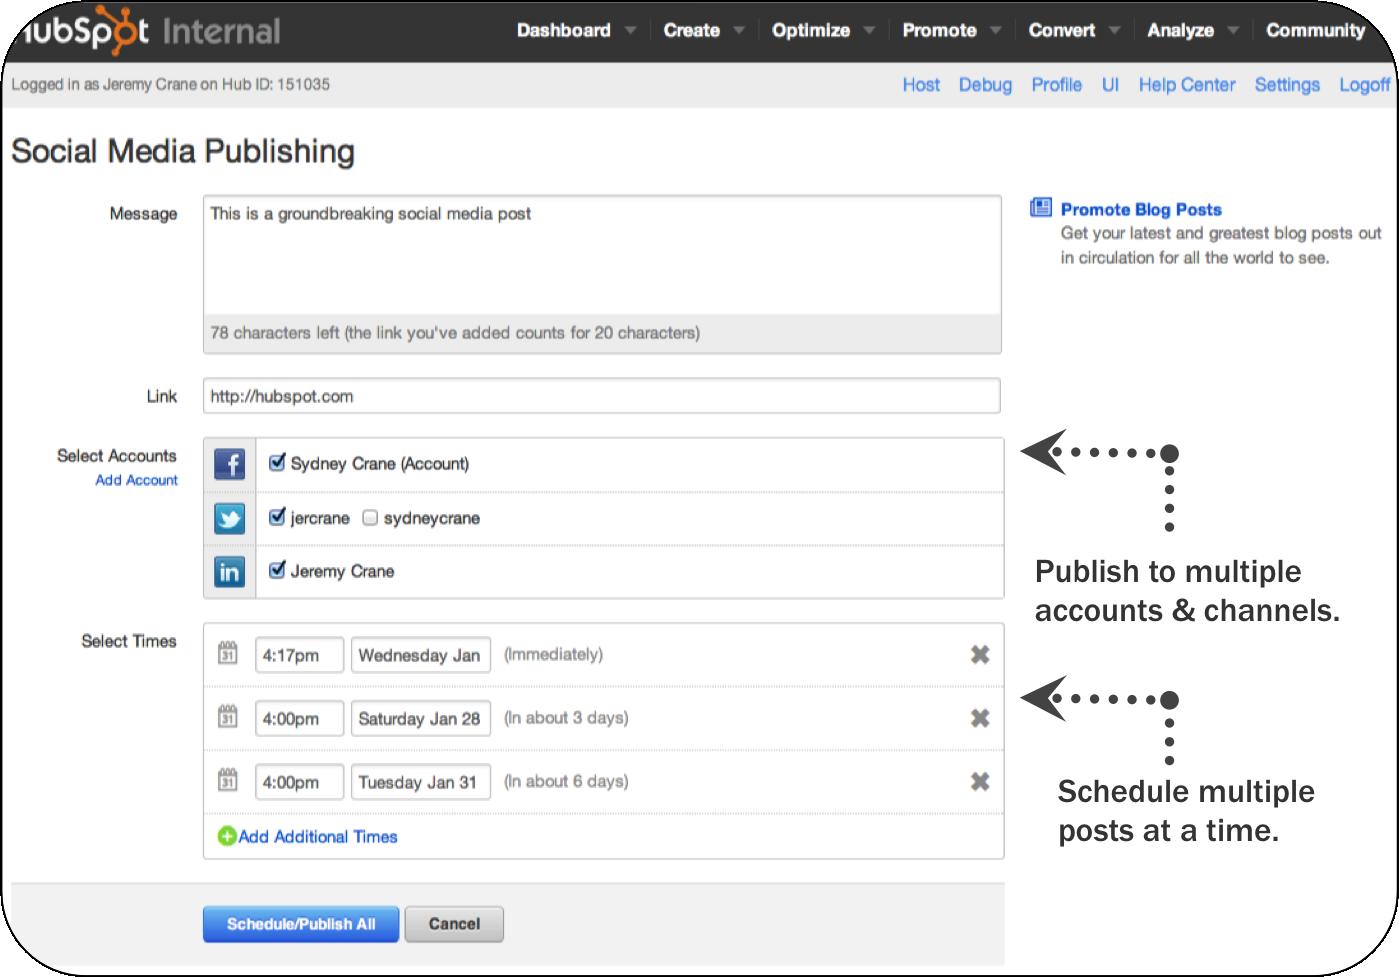 Social Media Publishing Screenshot